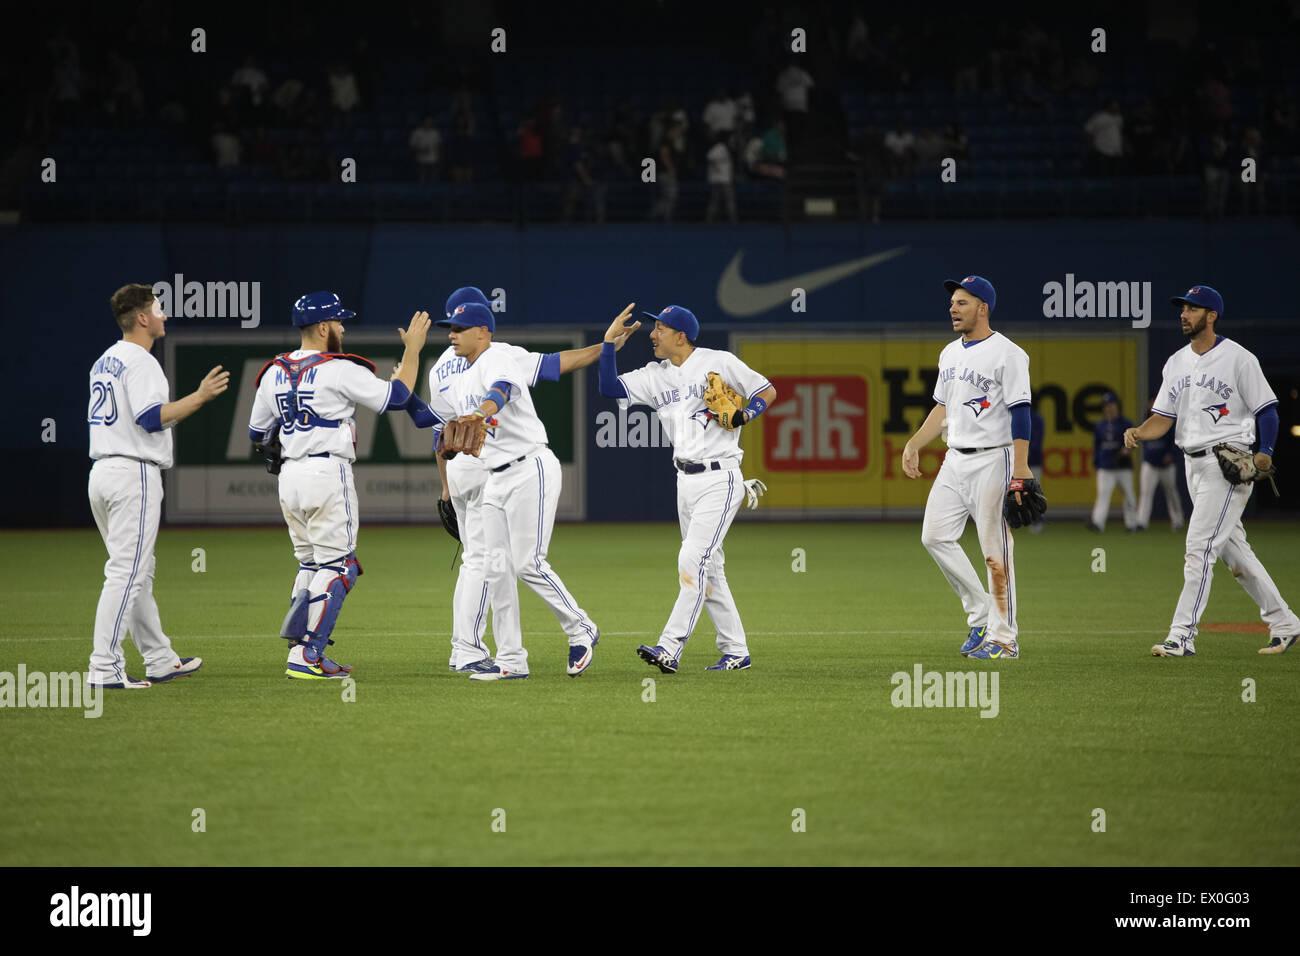 baseball players celebrate win blue jays - Stock Image